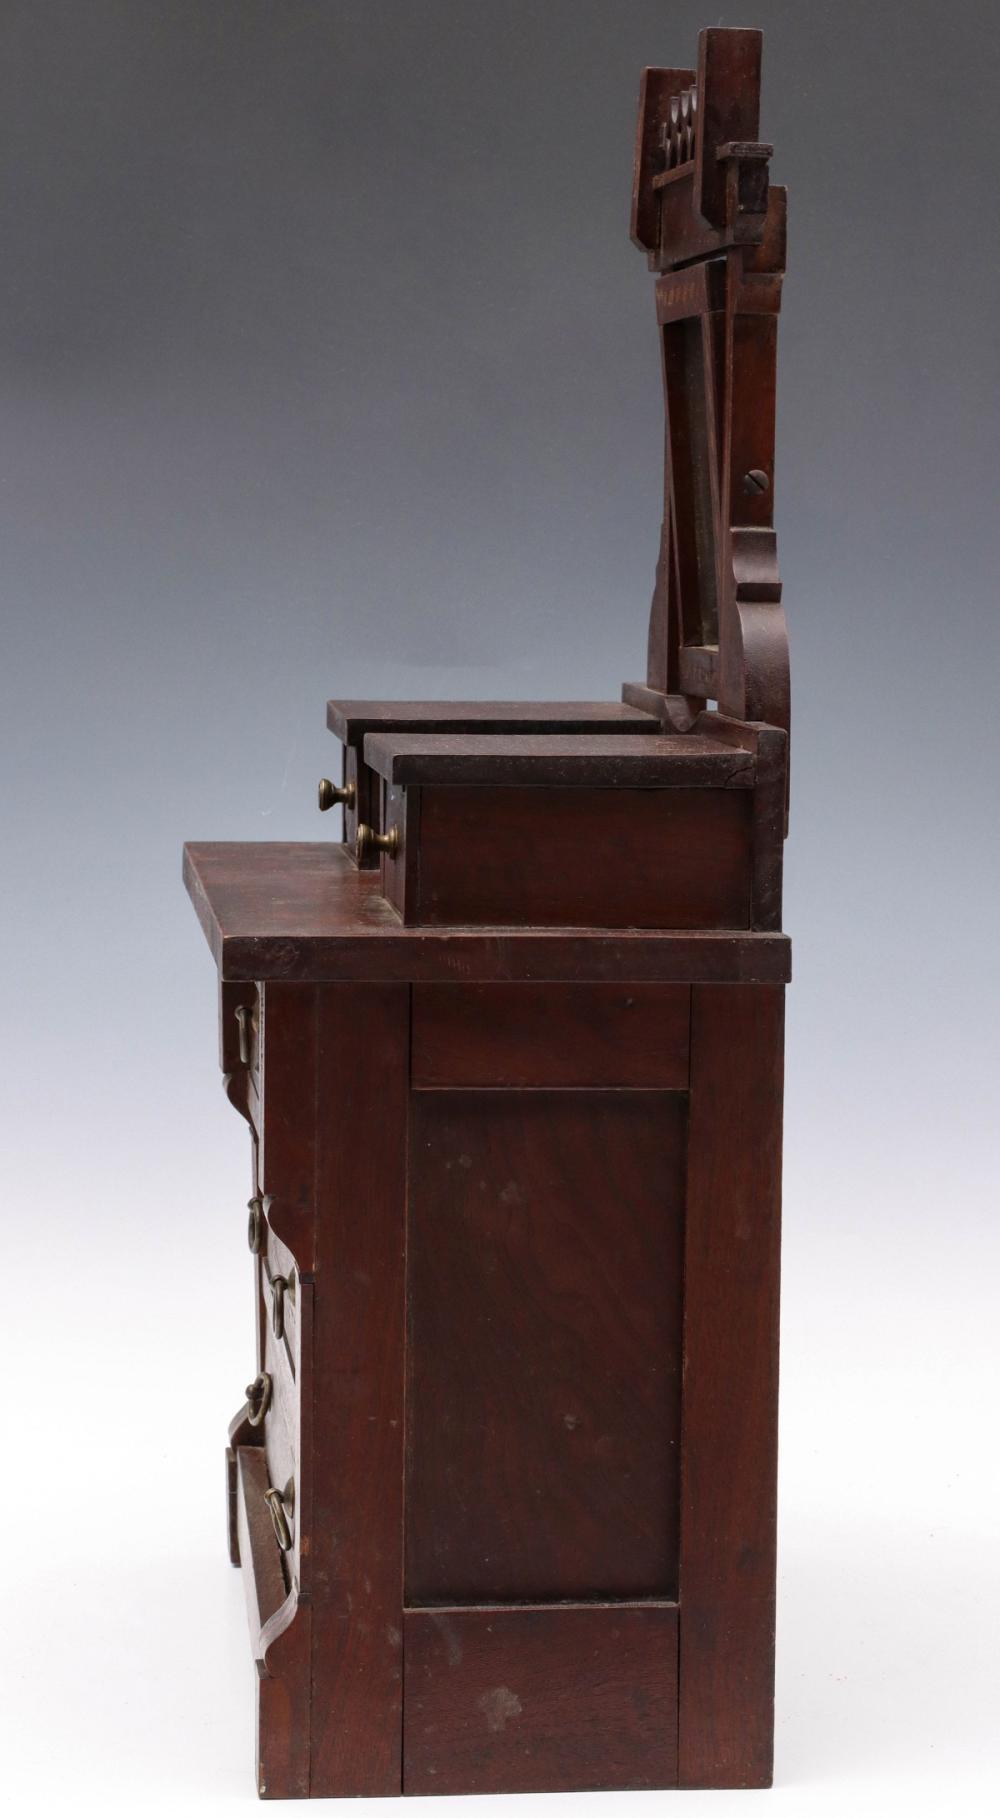 A MINIATURE 19C FOLK ART OR APPRENTICE DRESSER MODEL